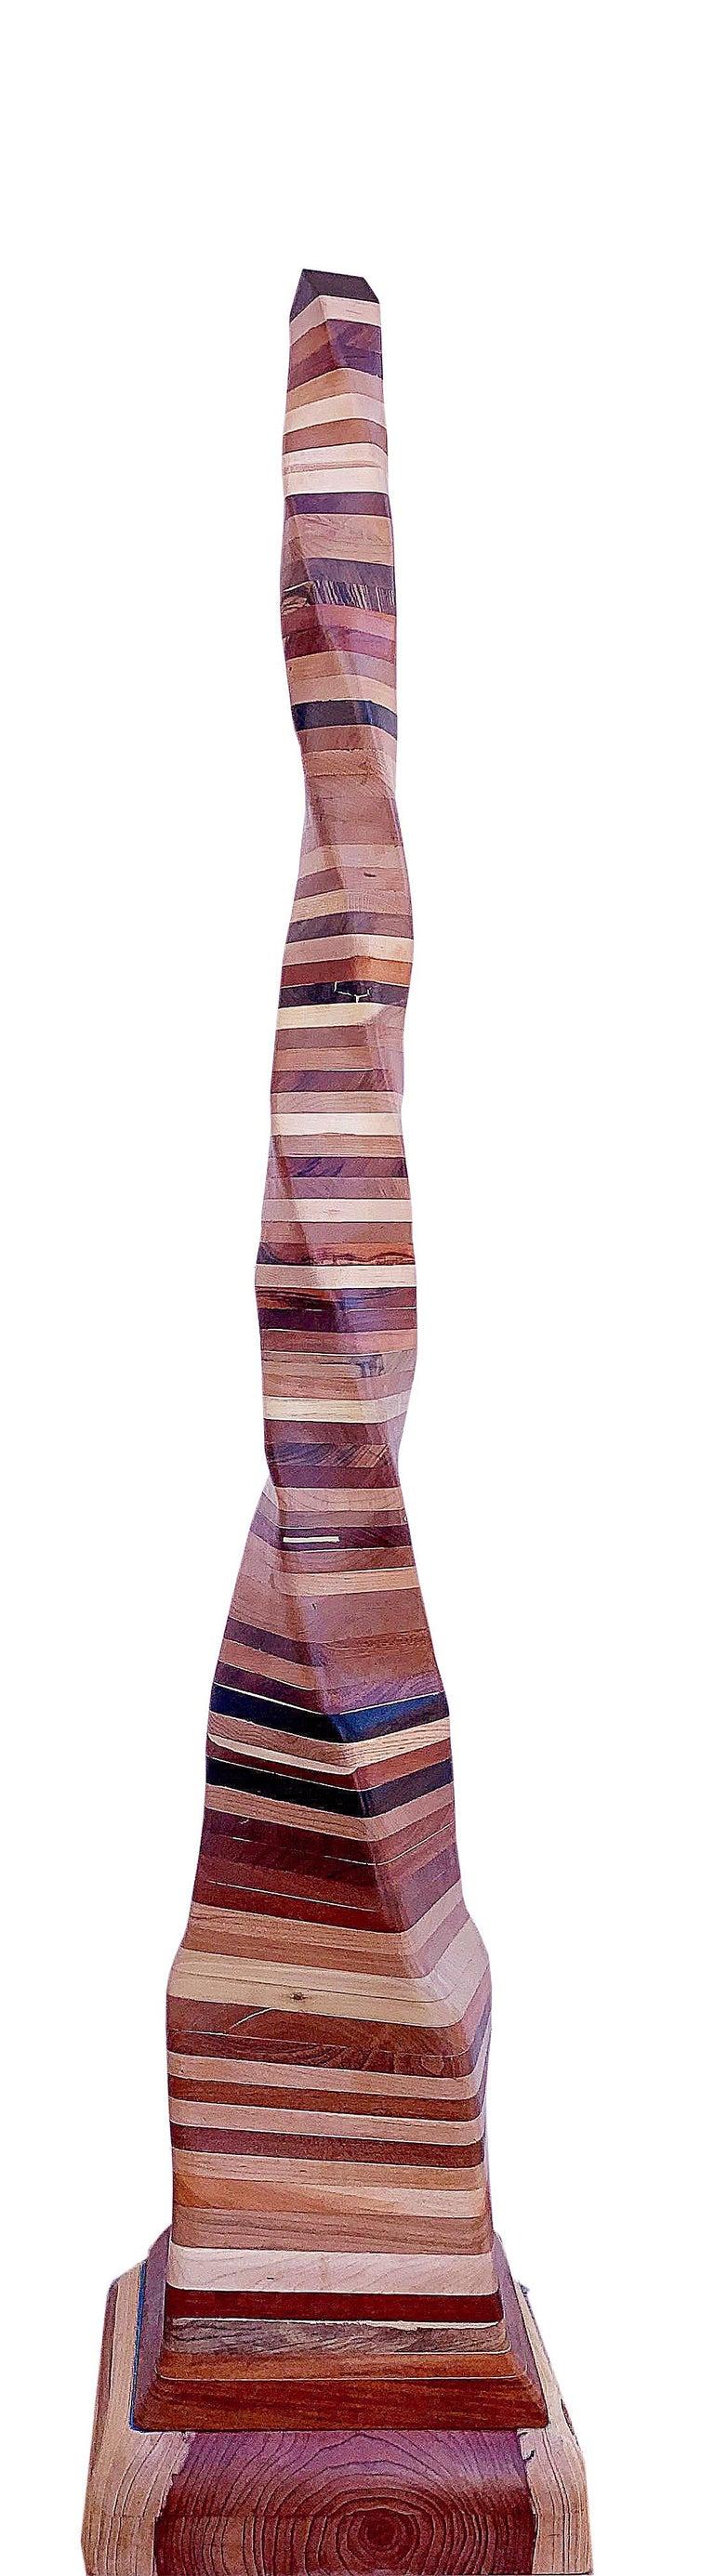 Ben Darby  Abstract Sculpture - Undulating Wood Sculpture, Untitled 2019